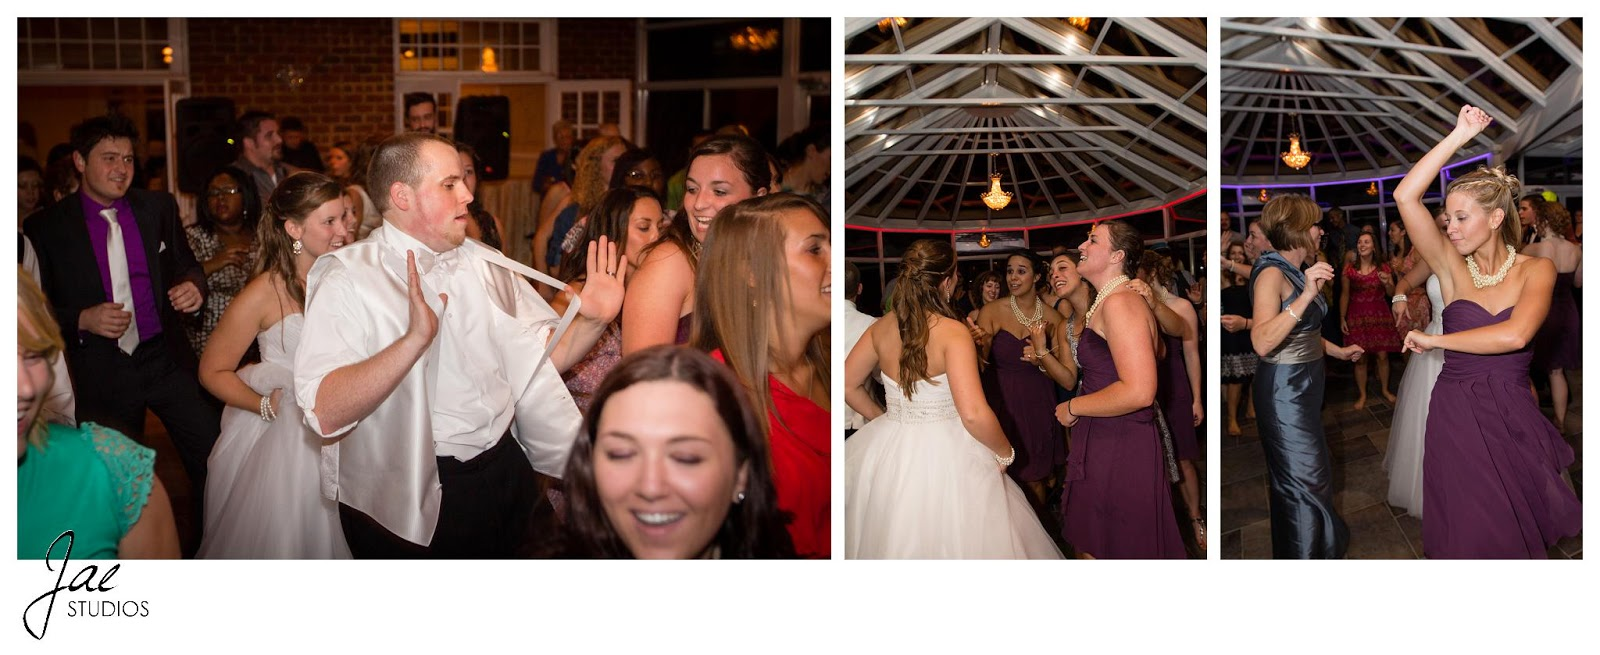 Jonathan and Julie, Bird cage, West Manor Estate, Wedding, Lynchburg, Virginia, Jae Studios, groom, bride, wedding dress, tuxedo, dancing, reception